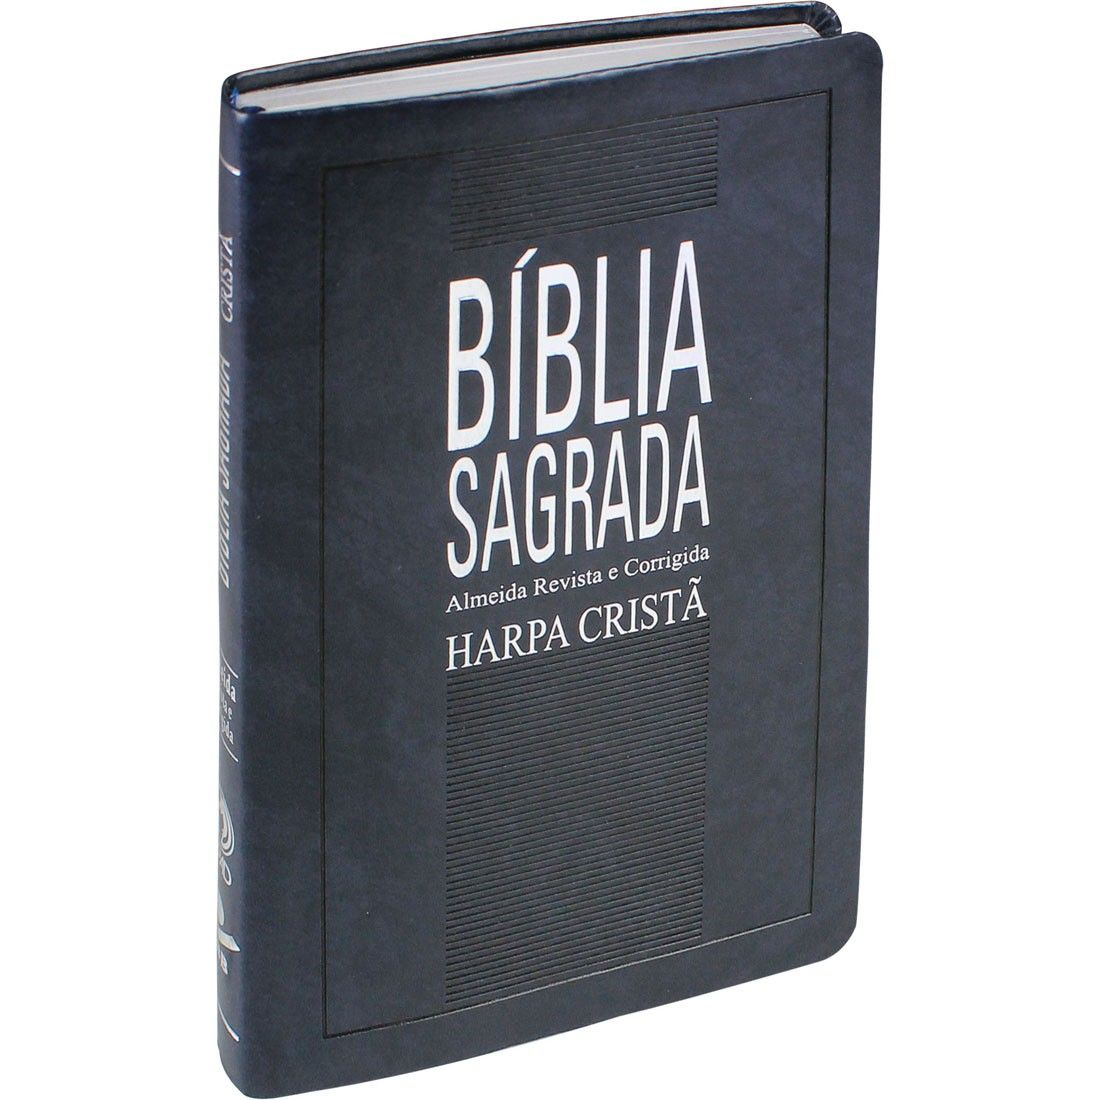 BÍBLIA SAGRADA COM HARPA CRISTÃ SLIM - AZUL ESCURO